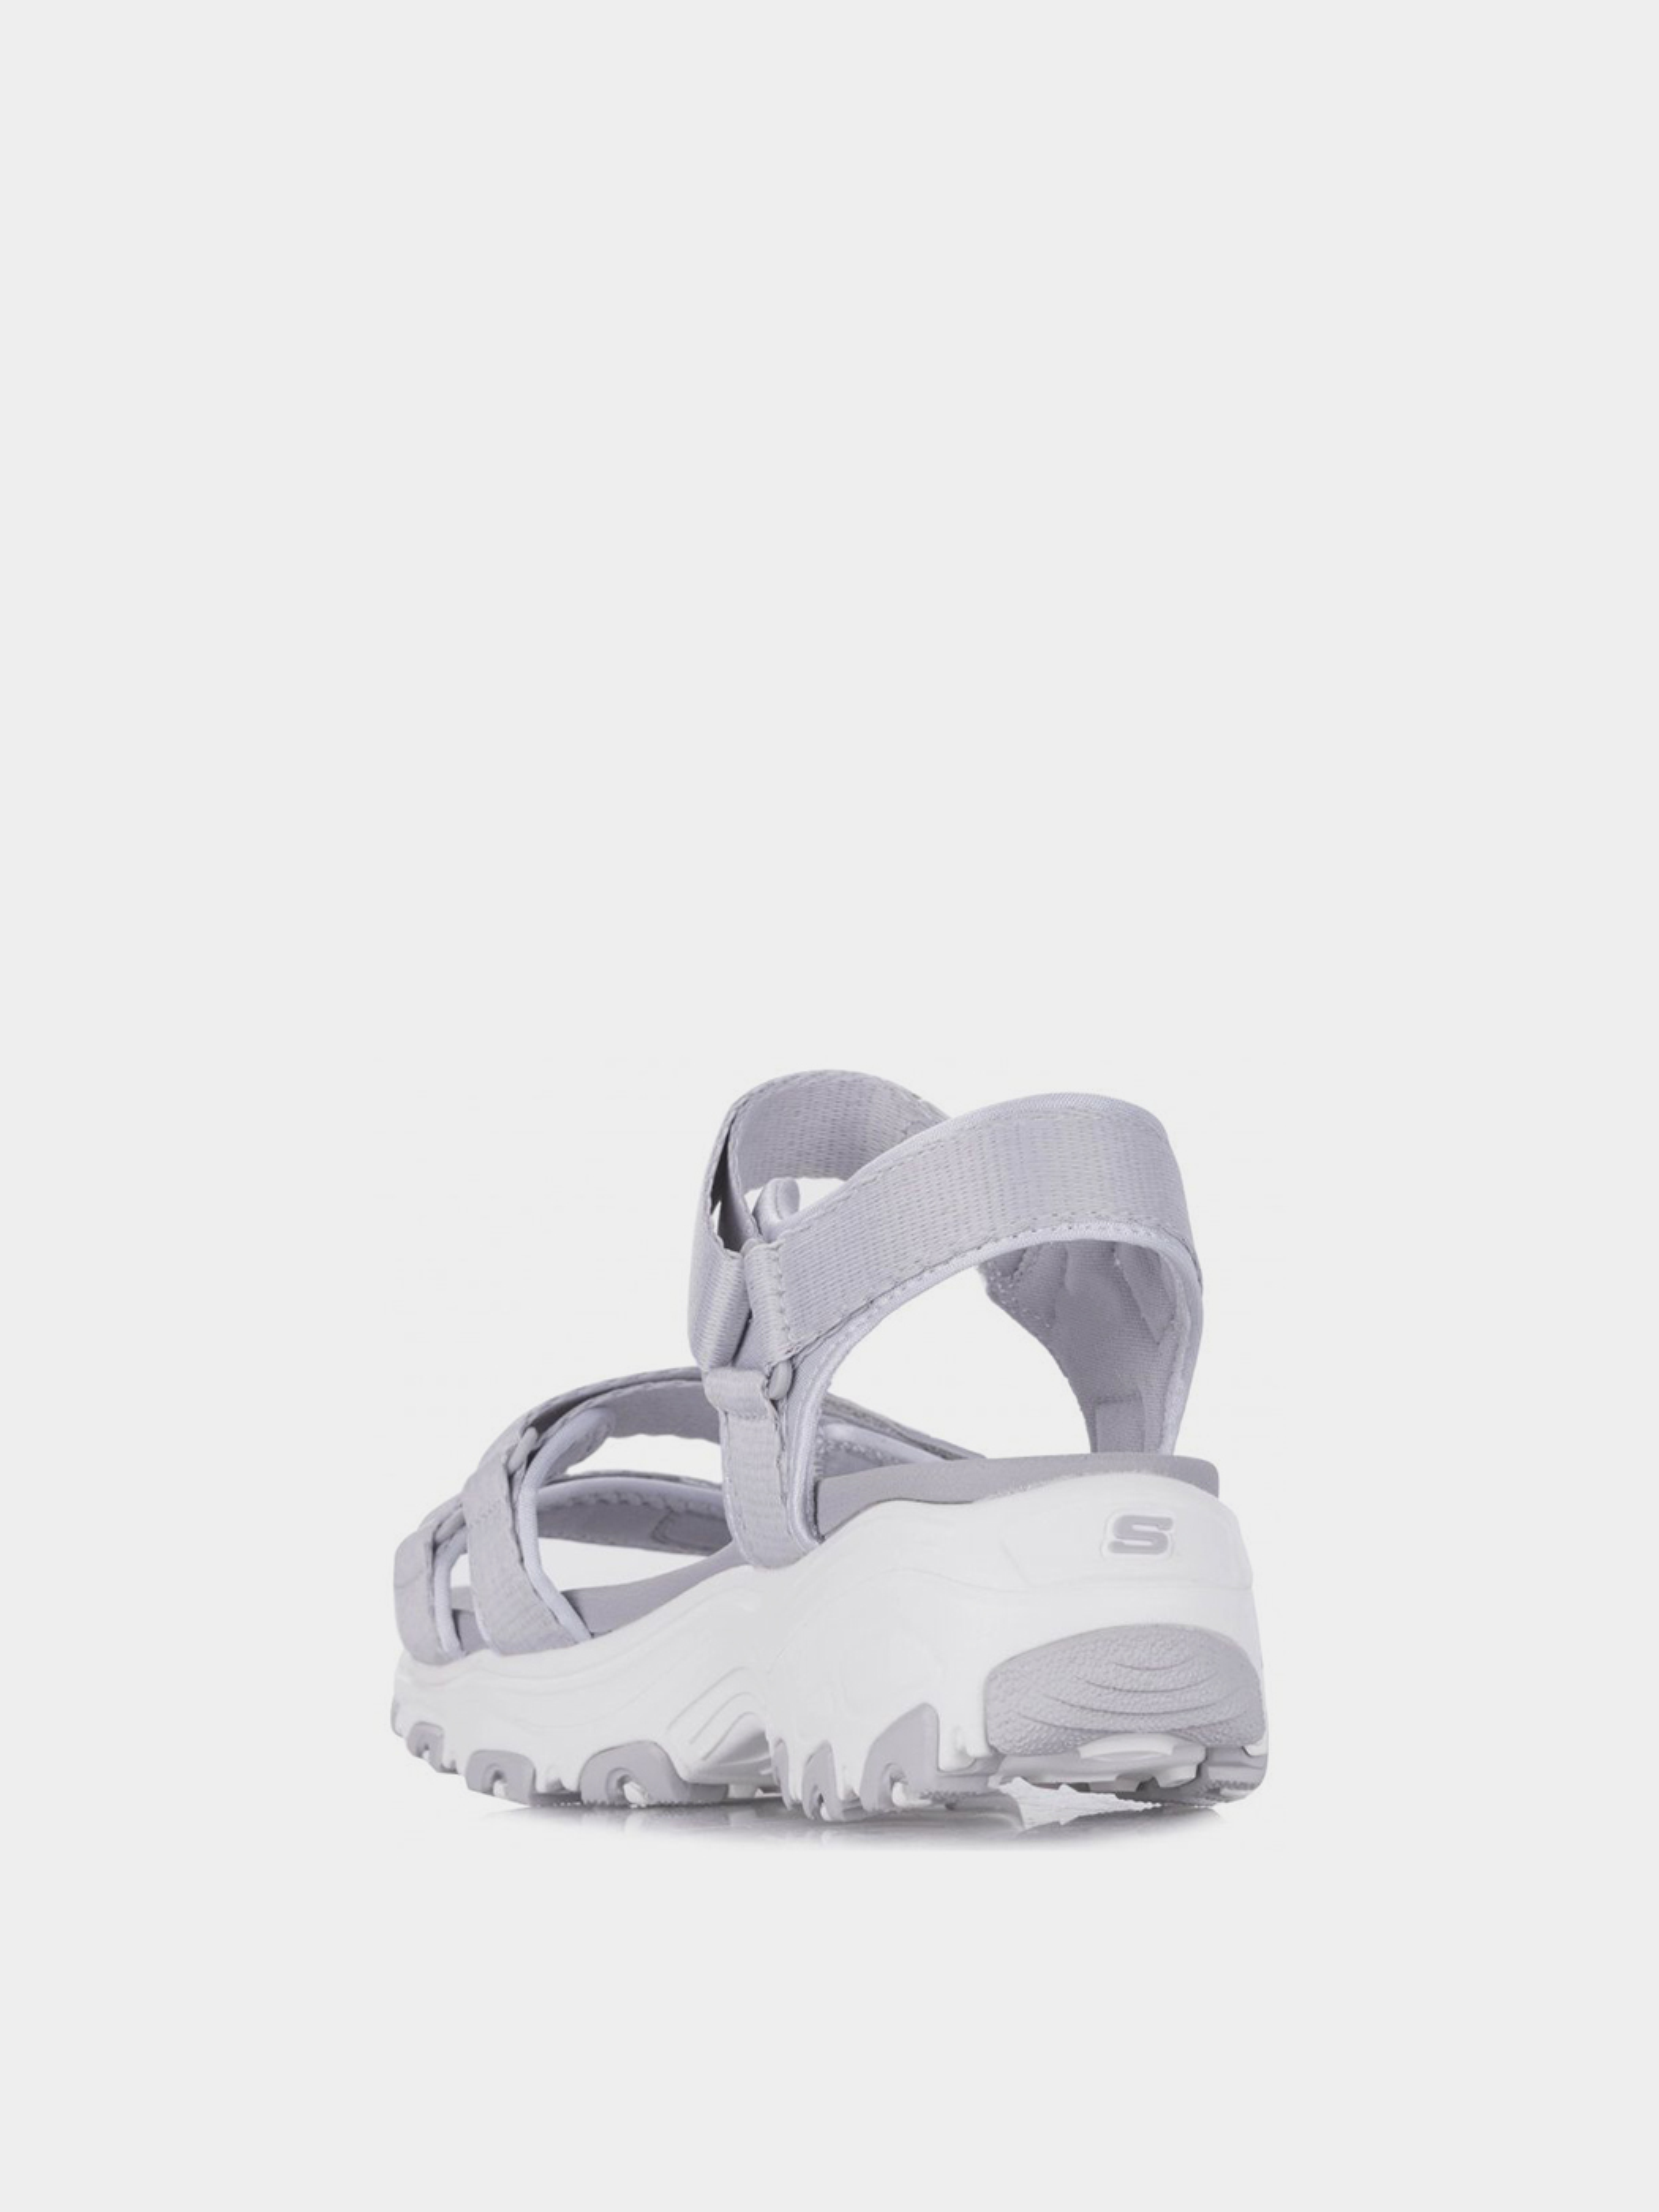 Сандалии для женщин Skechers D'Lites KW4717 Заказать, 2017